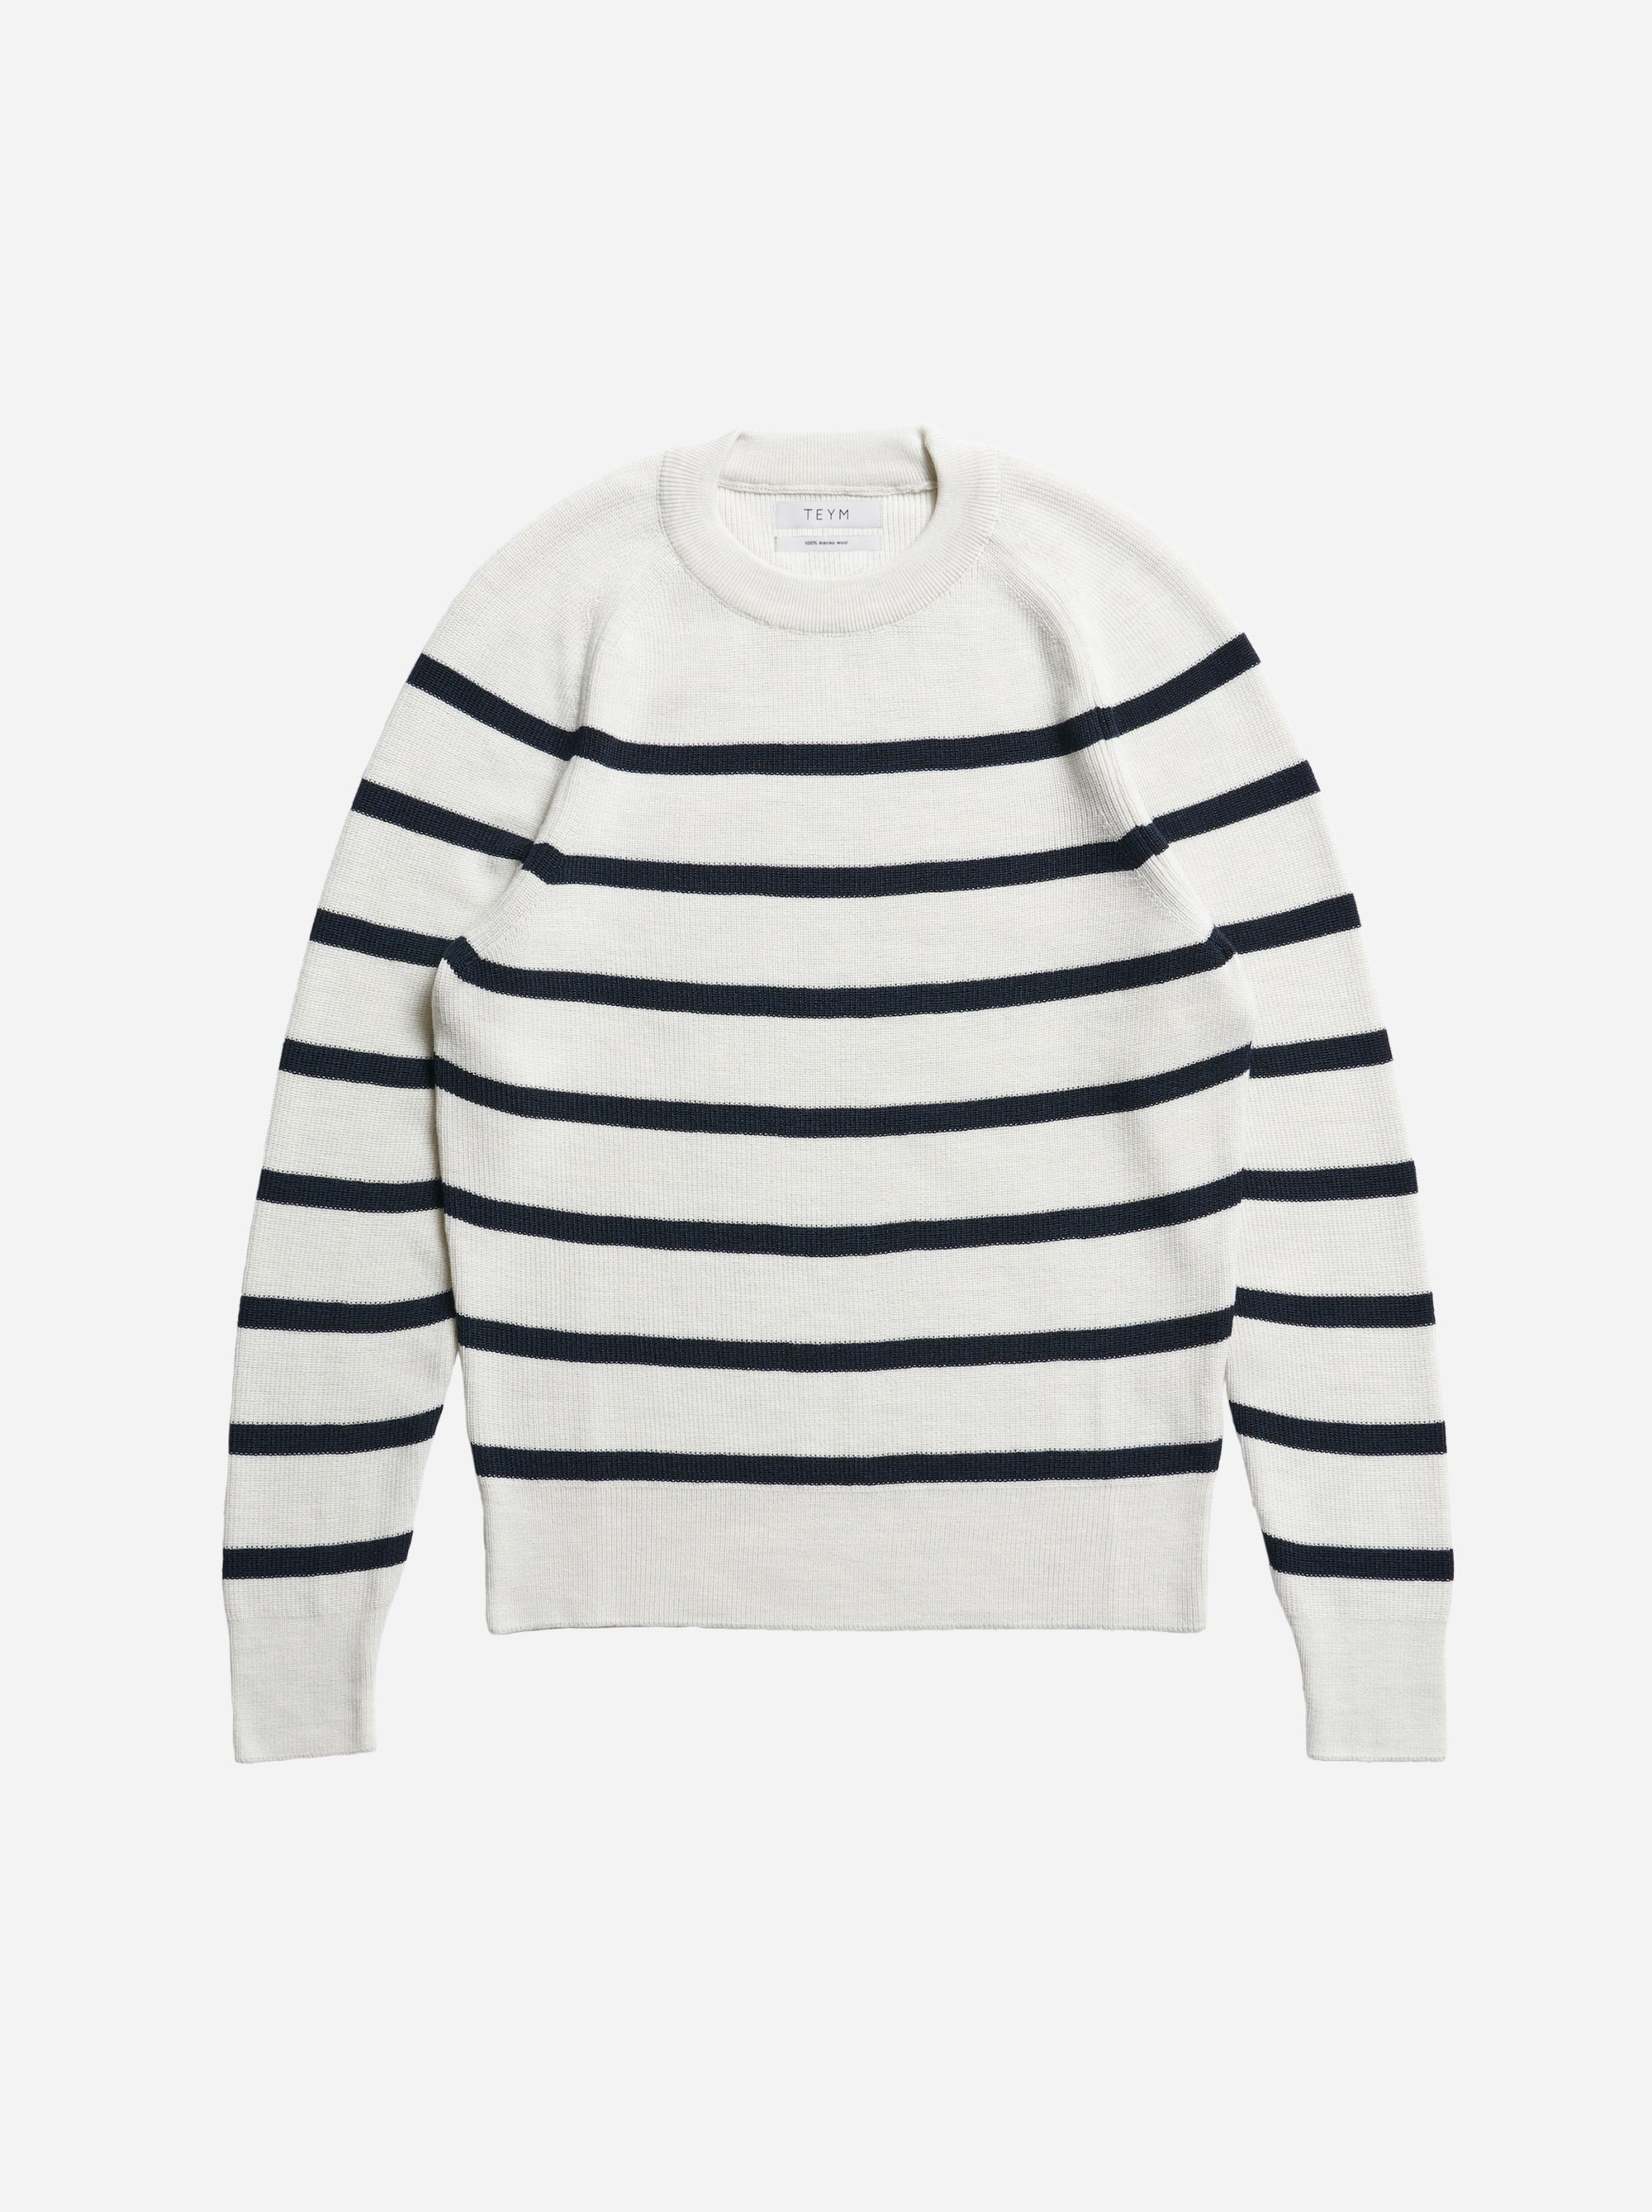 Teym - Crewneck - The Merino Sweater - Women - Striped - 4